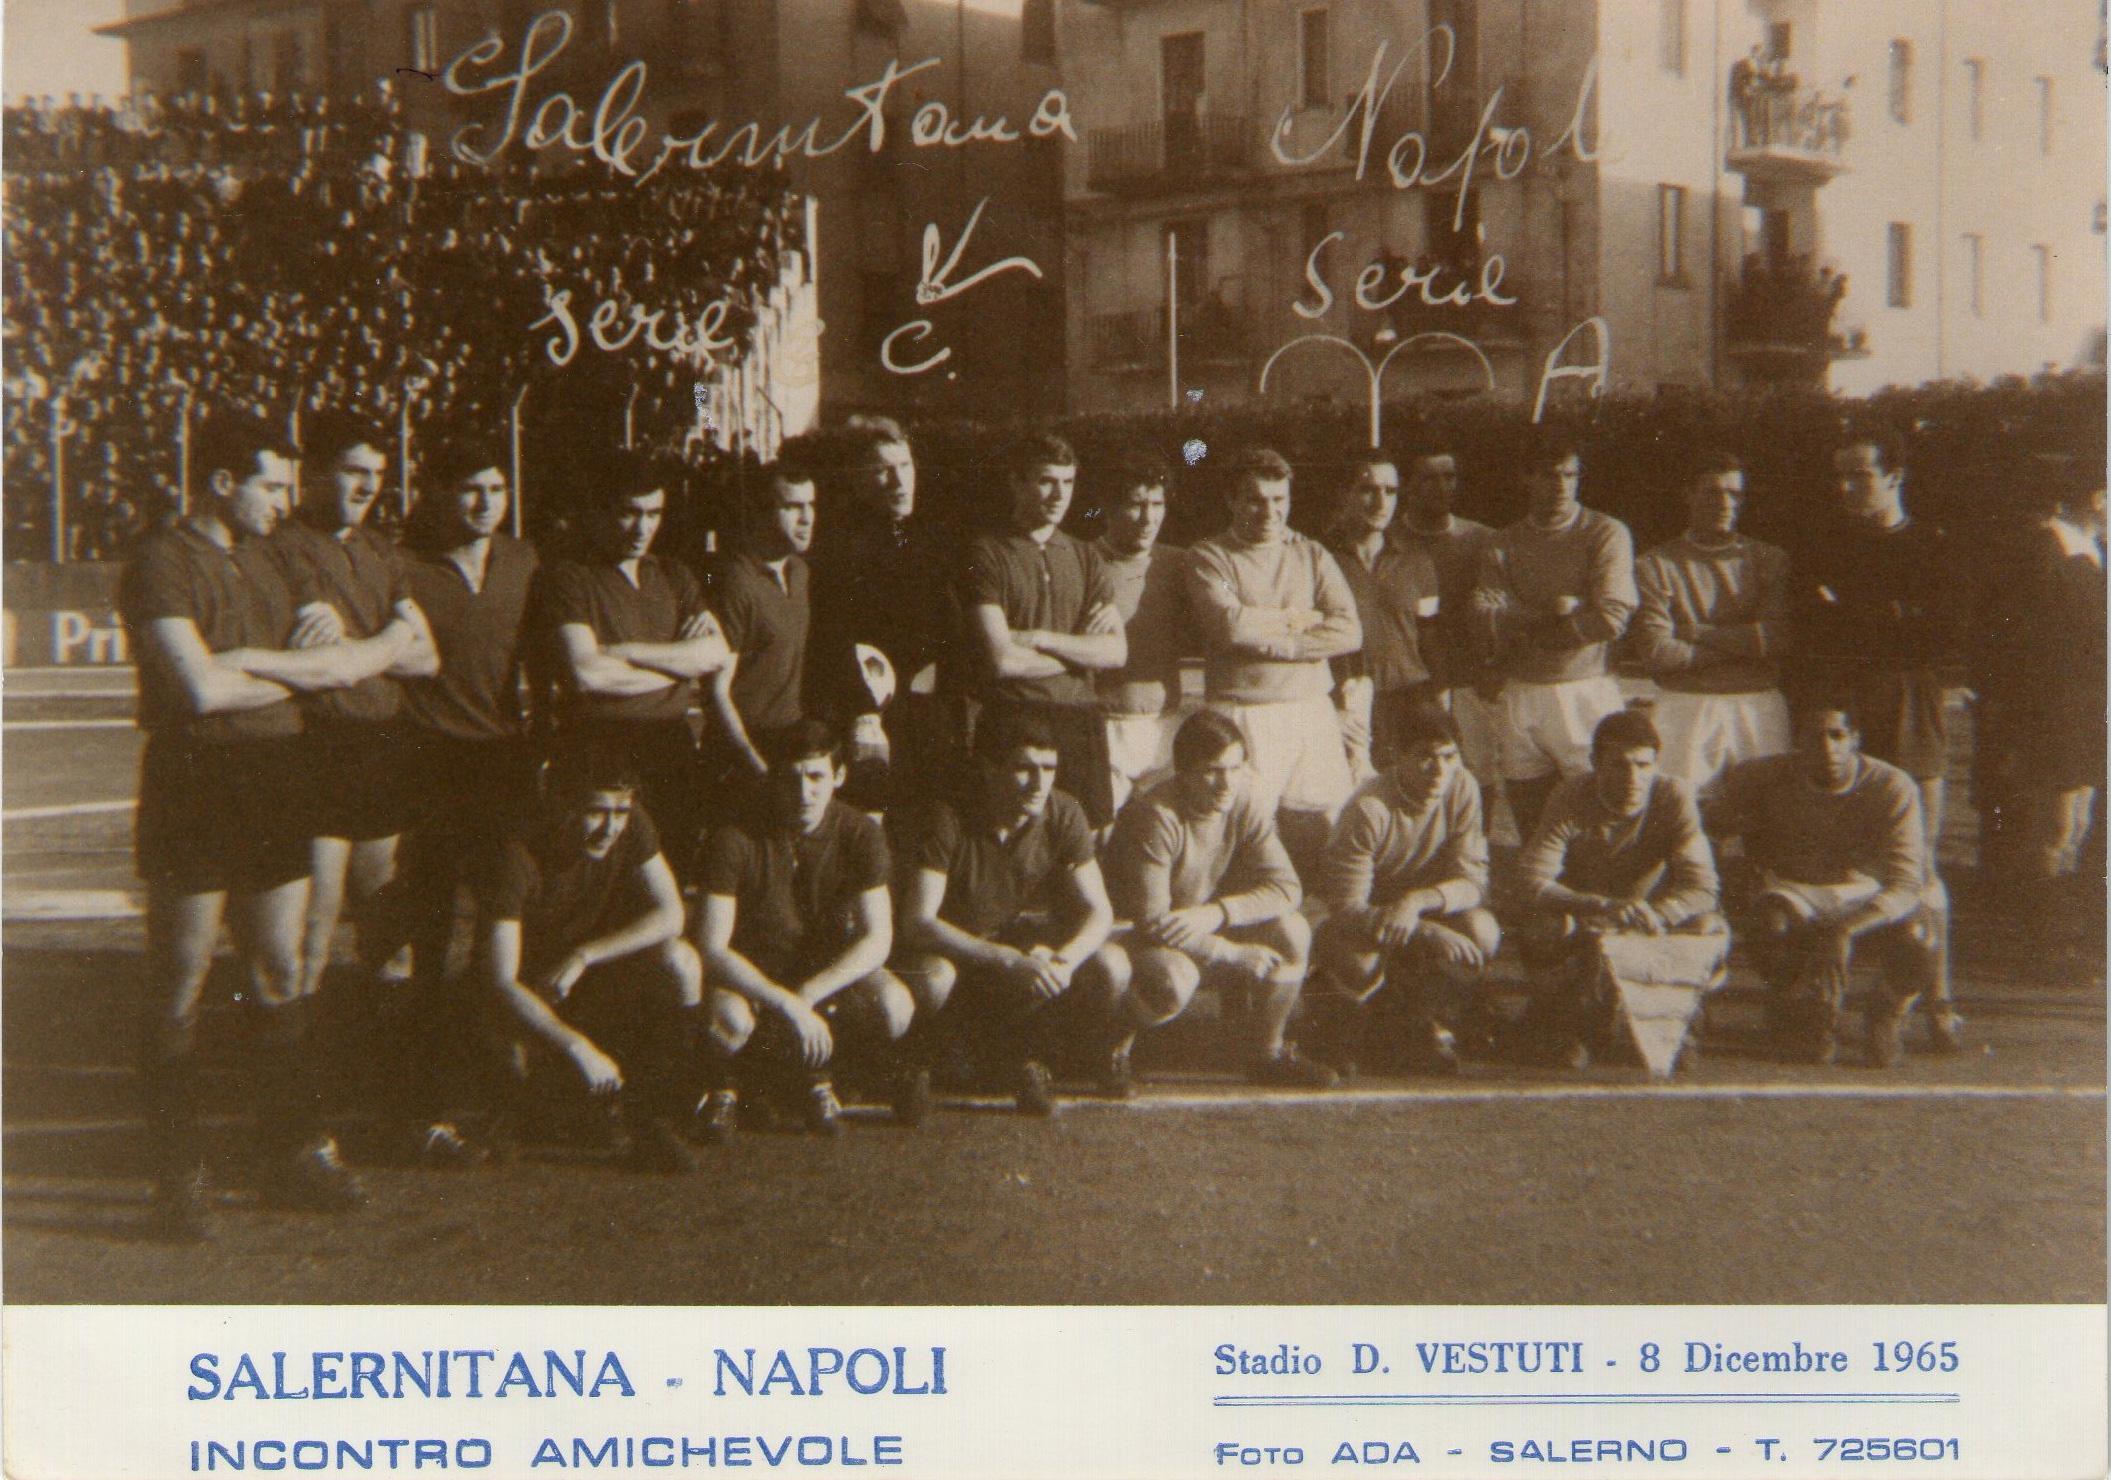 Amichevole Salernitana-Napoli 0-1